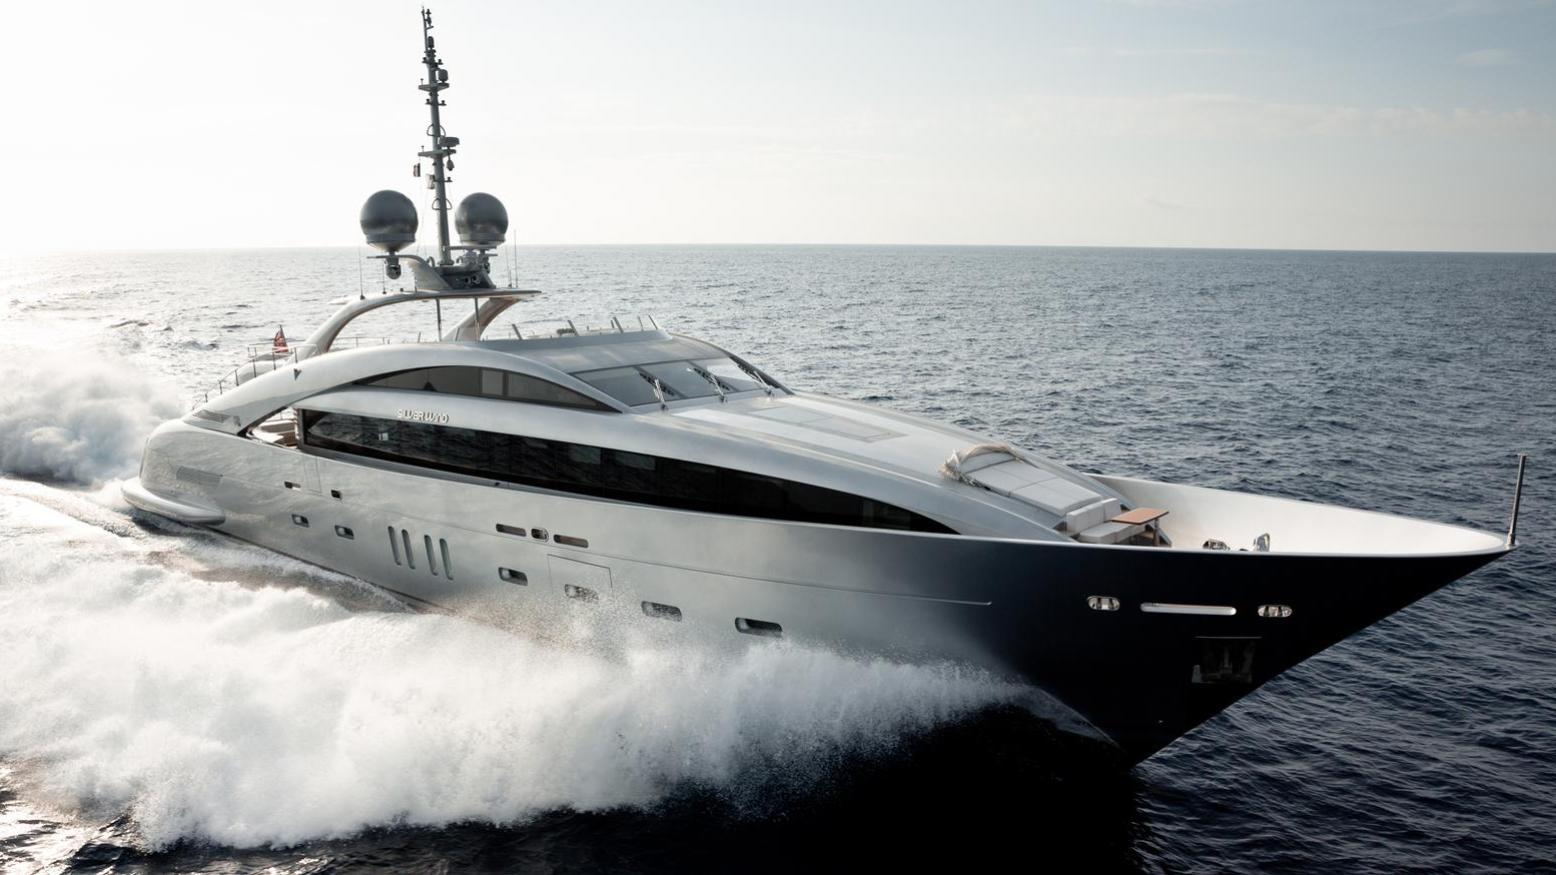 silver-wind-motor-yacht-isa-140-2014-44m-cruising